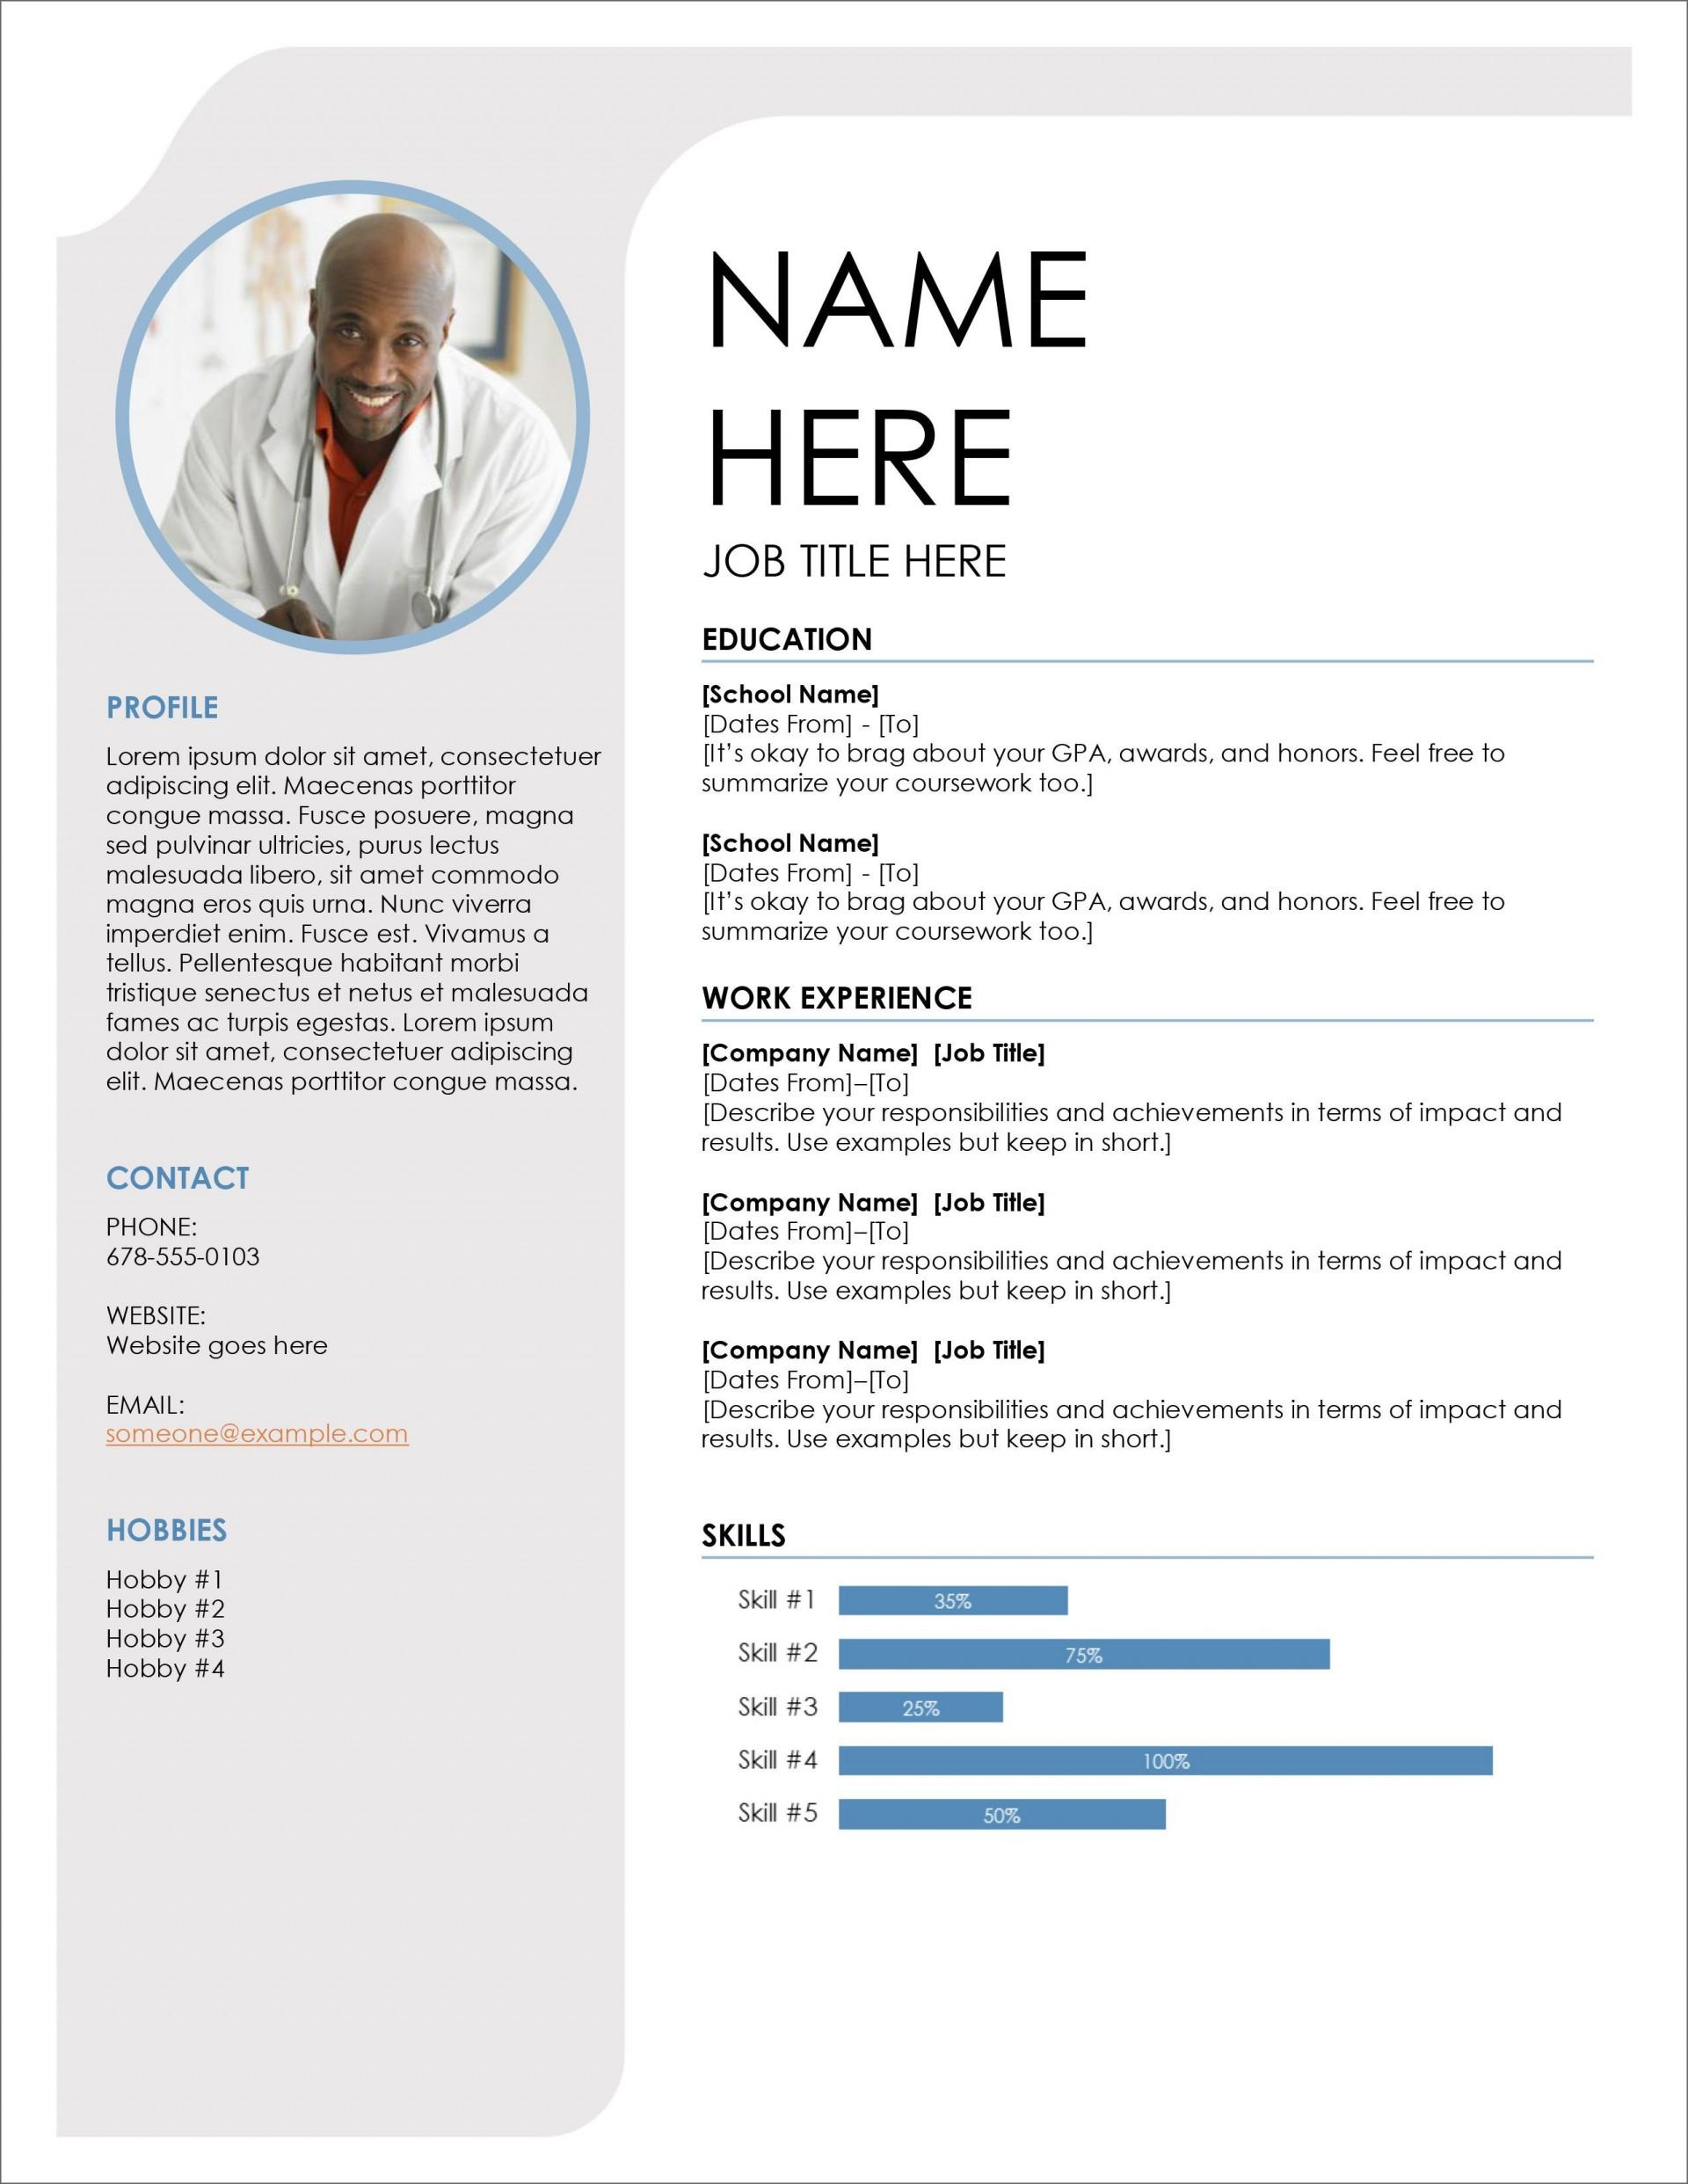 008 Wondrou Free Professional Resume Template Microsoft Word High Definition  Cv 20101920